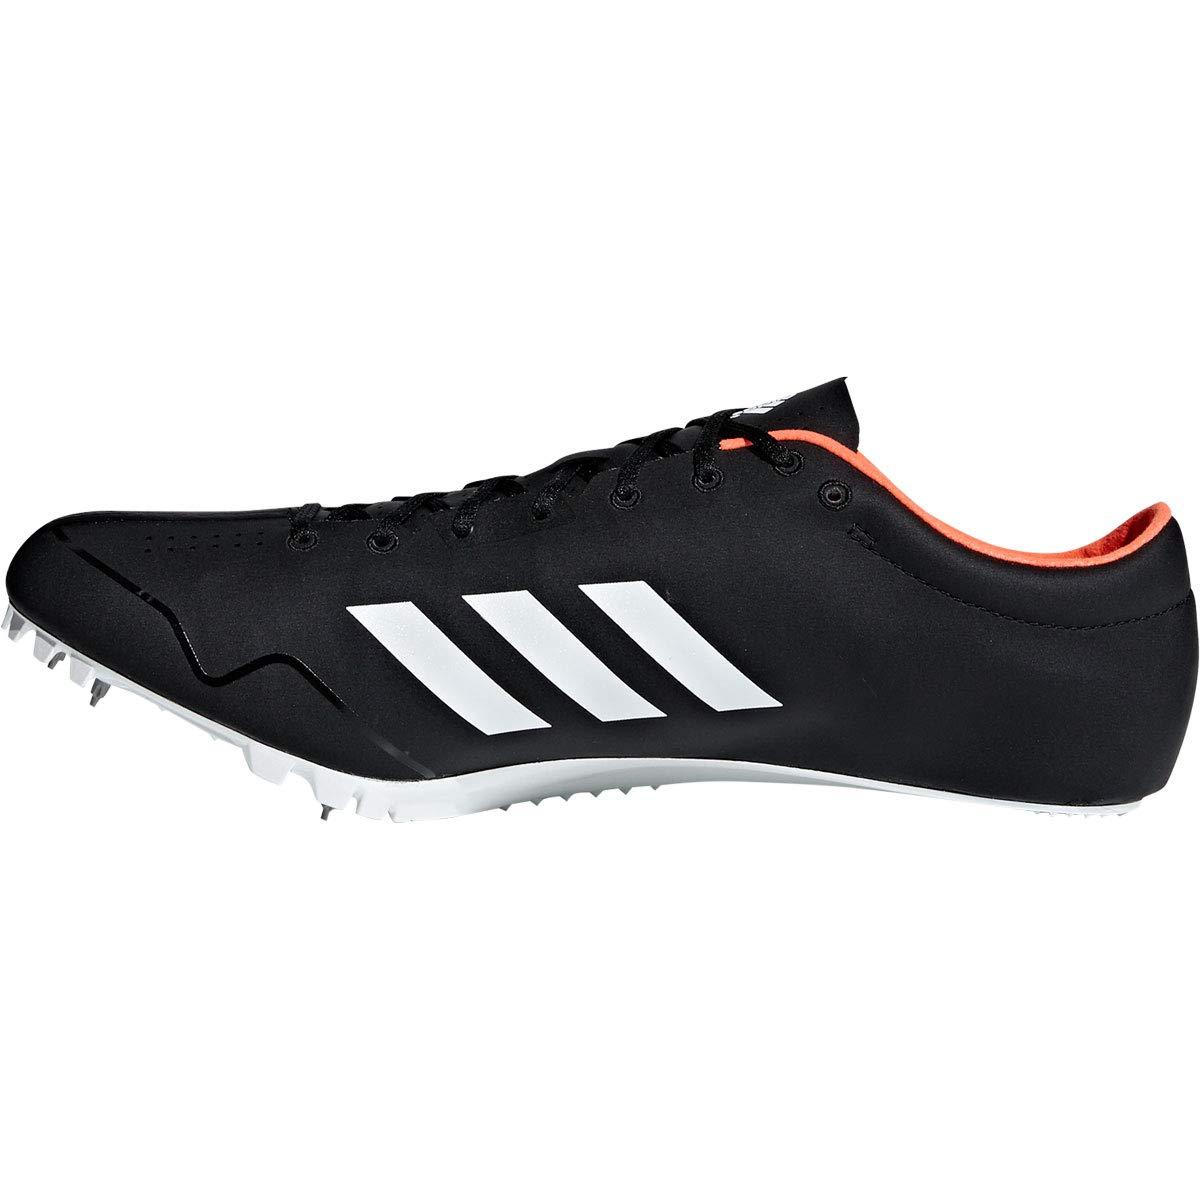 Adidas Unisex-Erwachsene Adizero Adizero Adizero Prime Sprint Spike Leichtathletikschuhe b9ca42